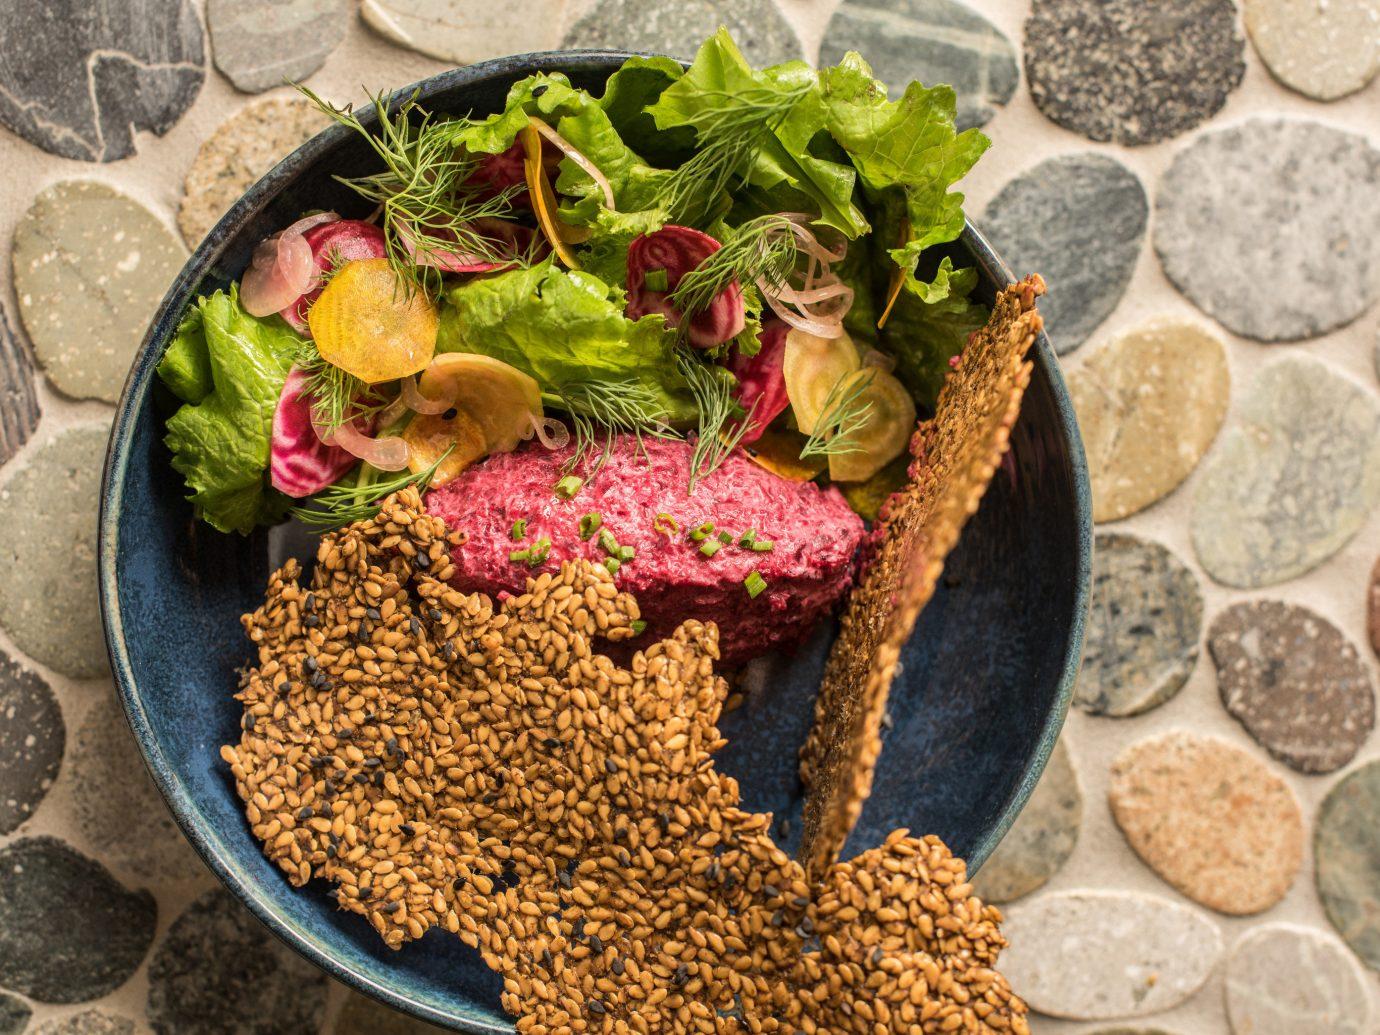 Food + Drink food produce flower vegetable herb several